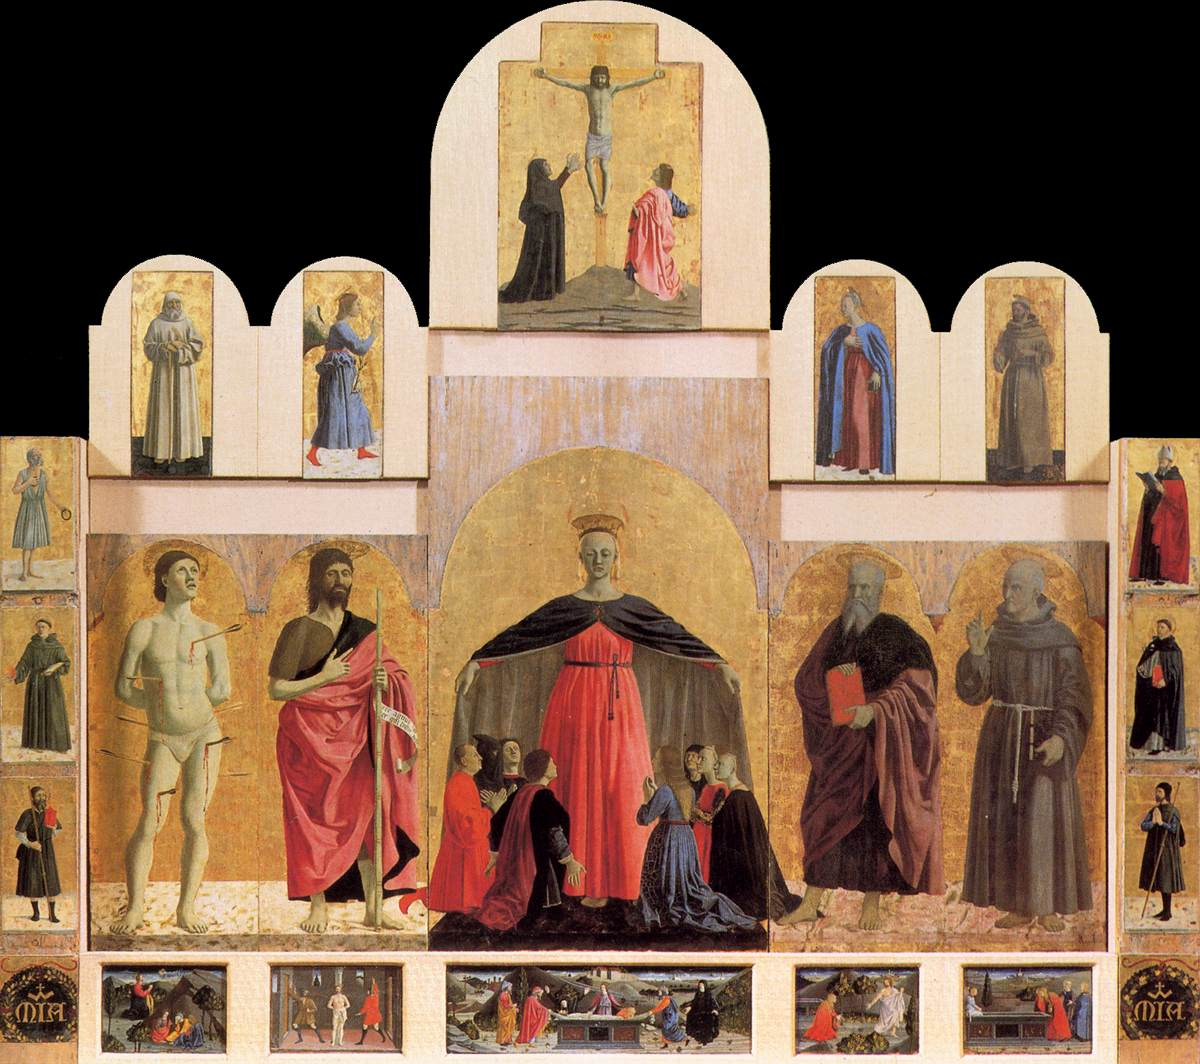 Polyptych of the Misericordia by PIERO DELLA FRANCESCA